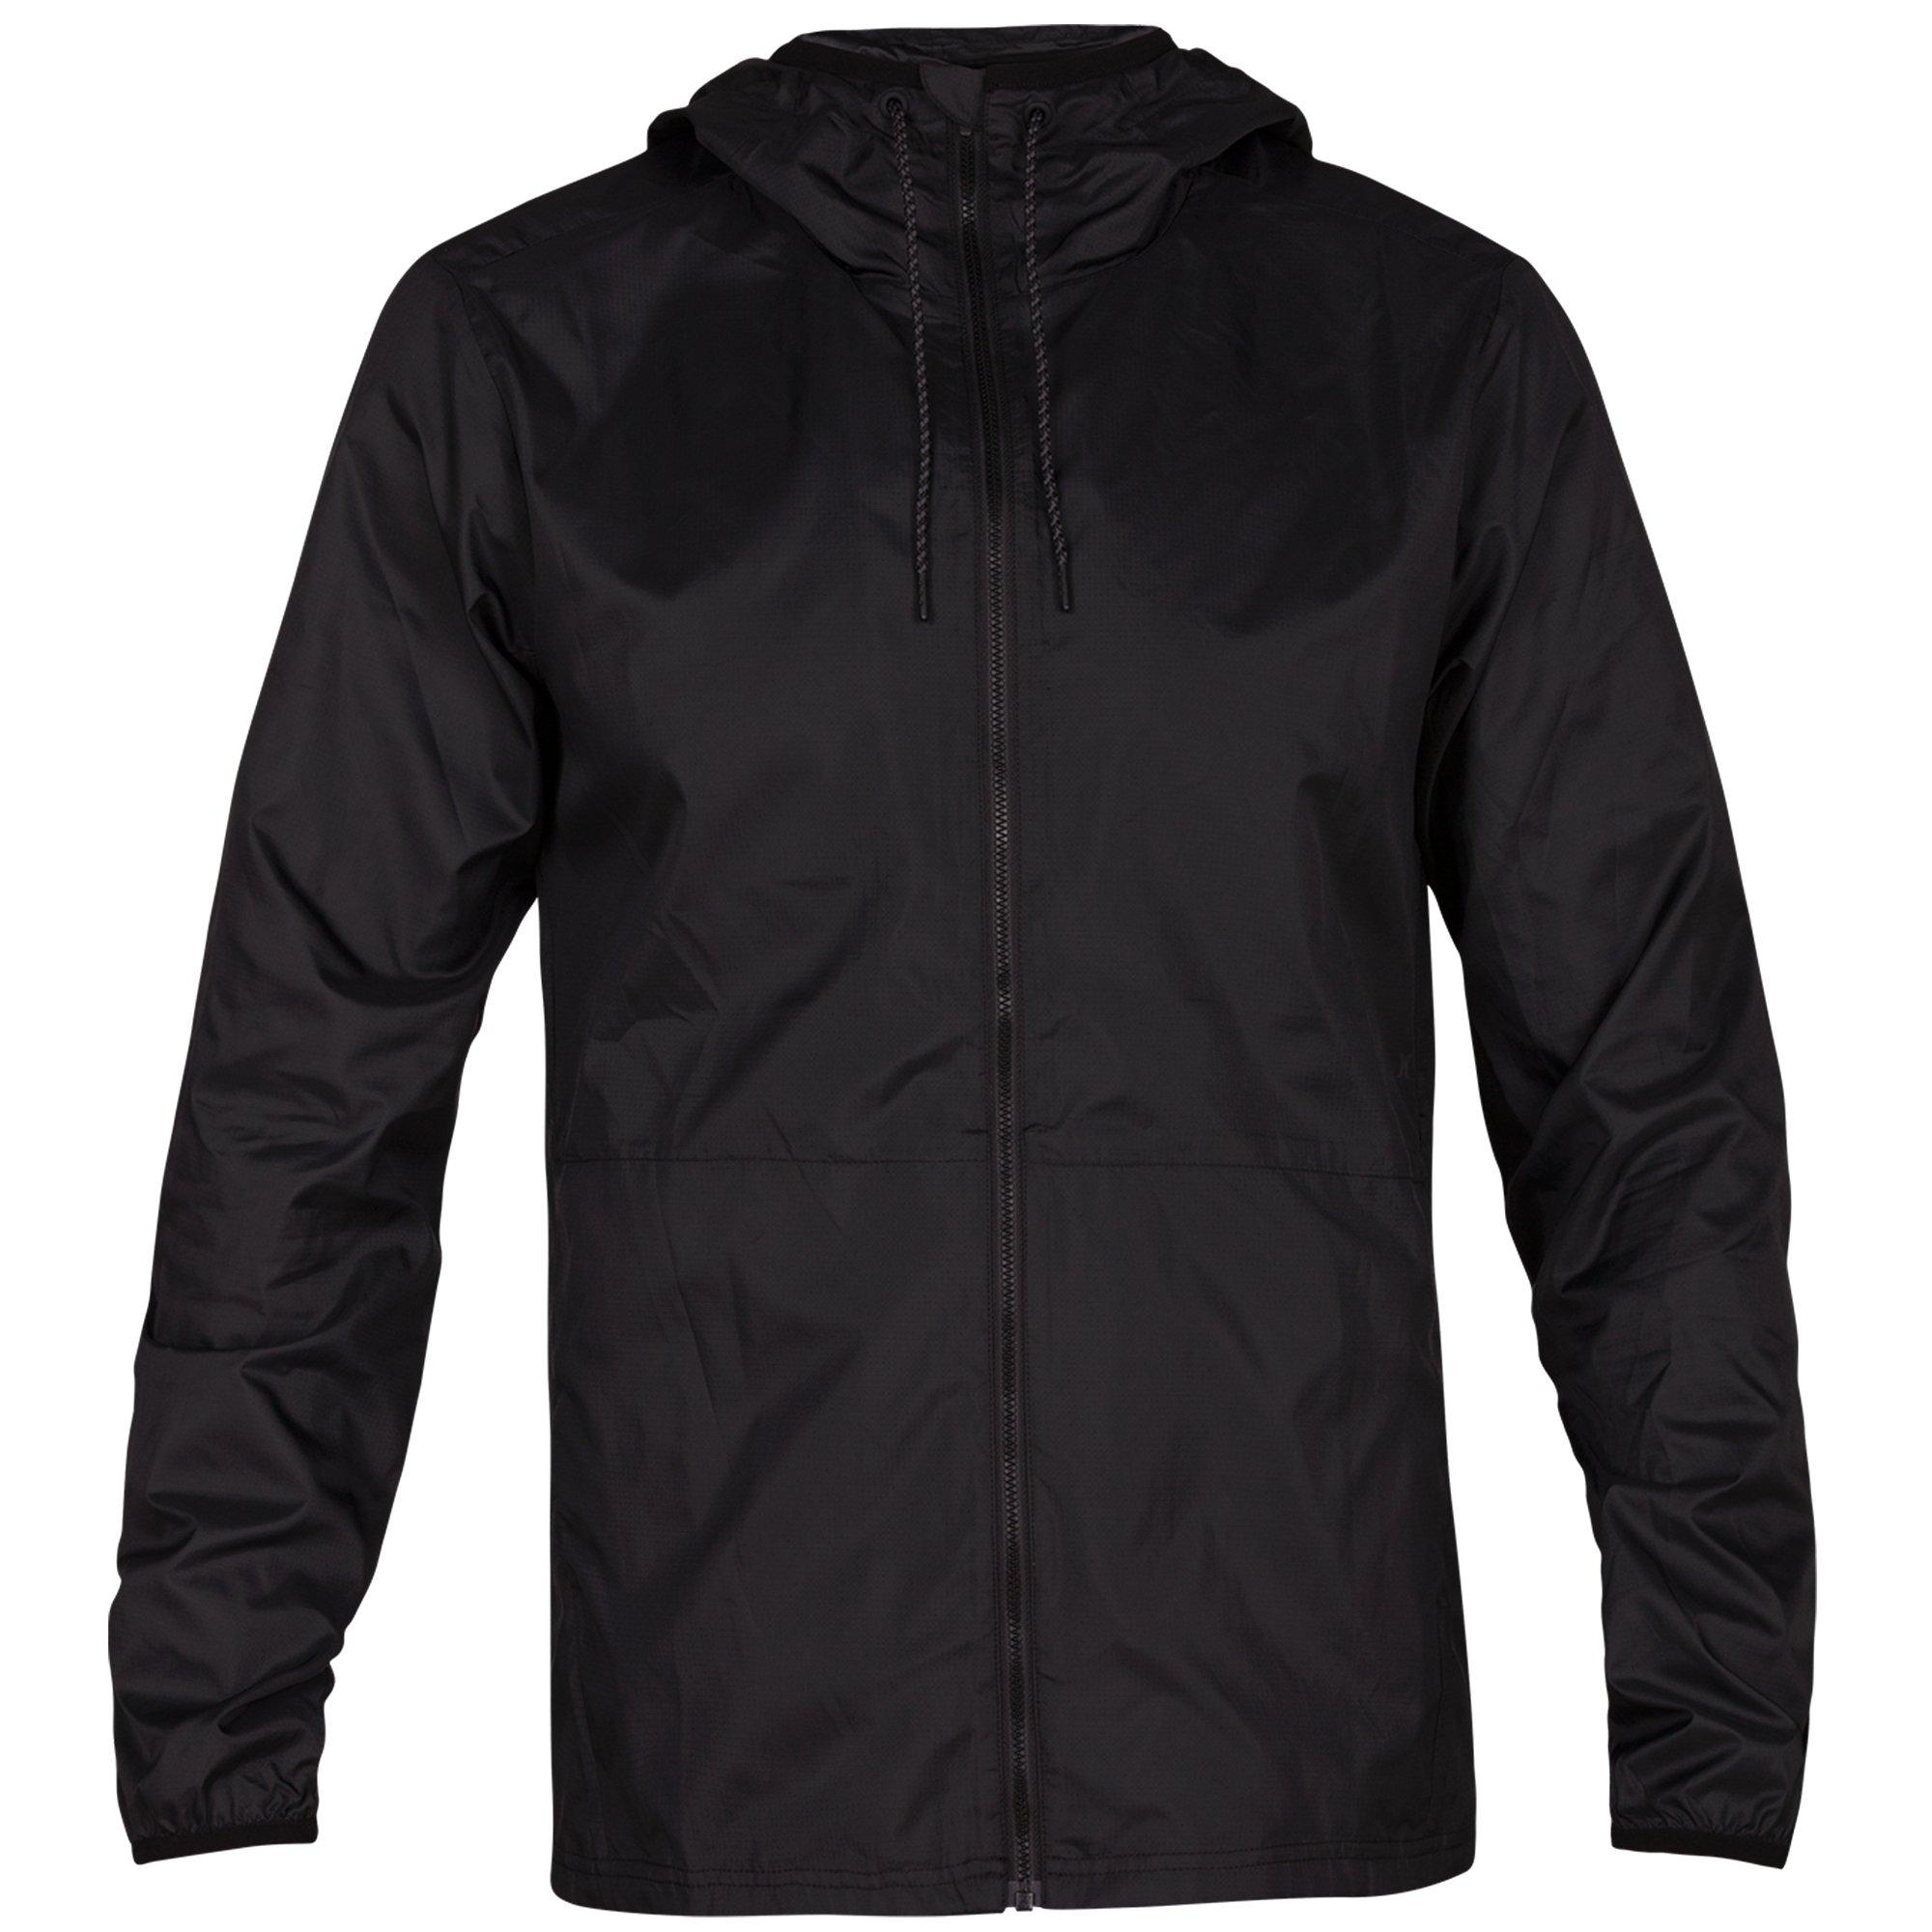 Hurley Men's Solid Protect Hooded Windbreaker, Black, XL